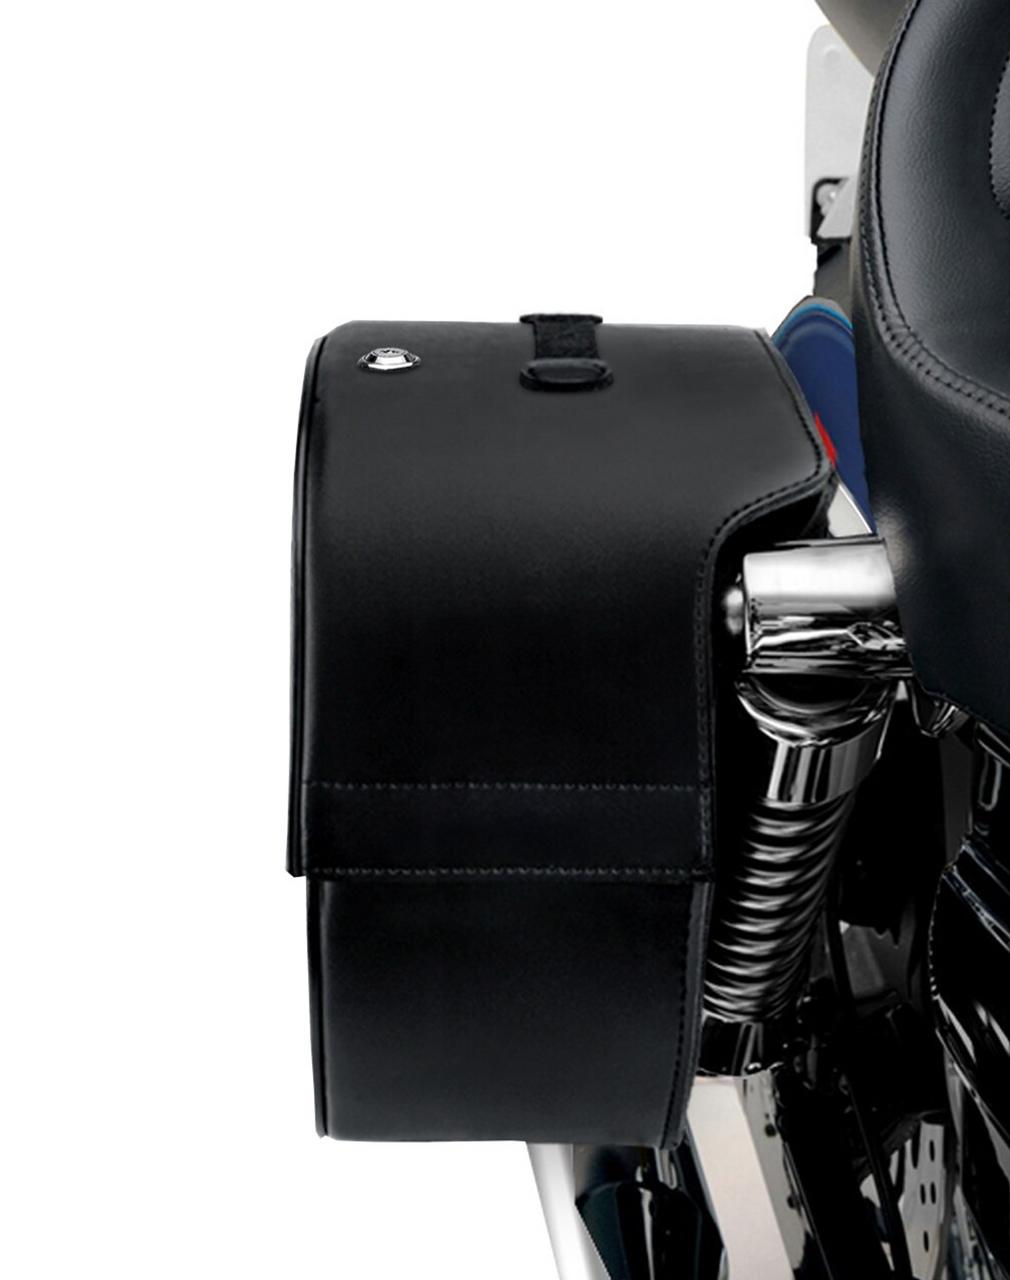 Triumph Rocket III Roadster Viking Armor Shock Cutout Studded Motorcycle Saddlebags Shock Cutout View